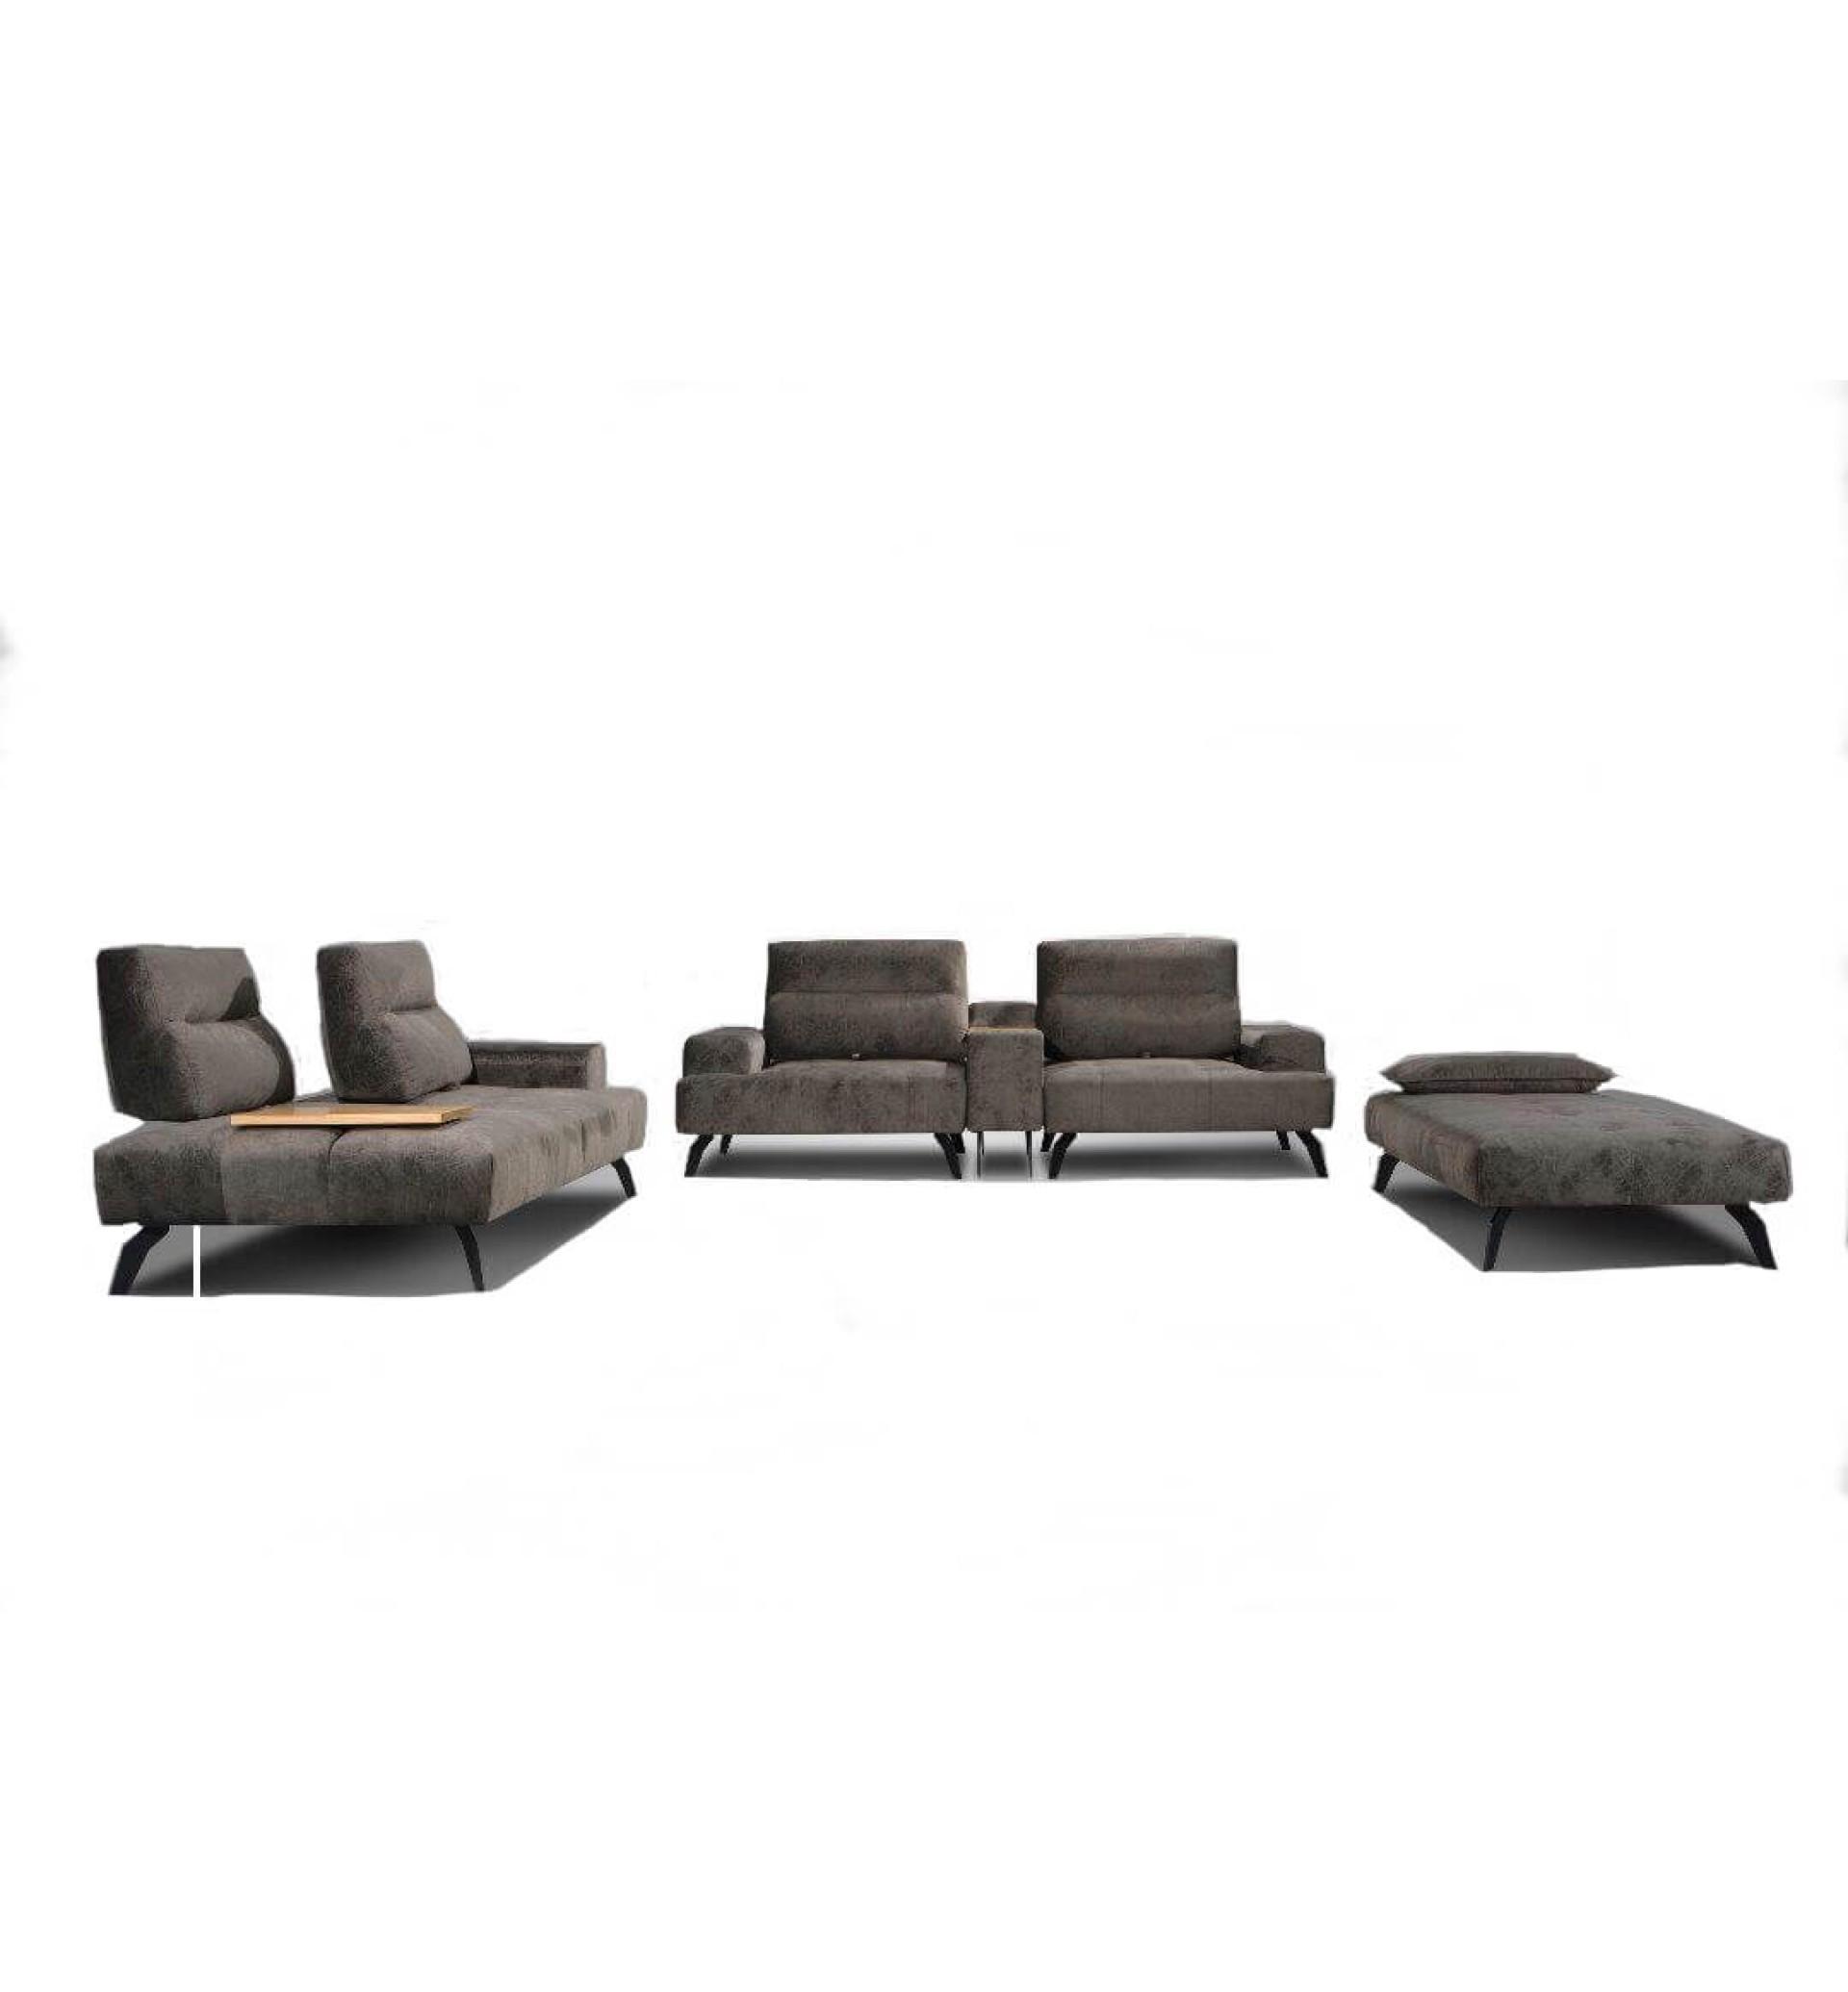 Laveo Luxe Europe Sofa